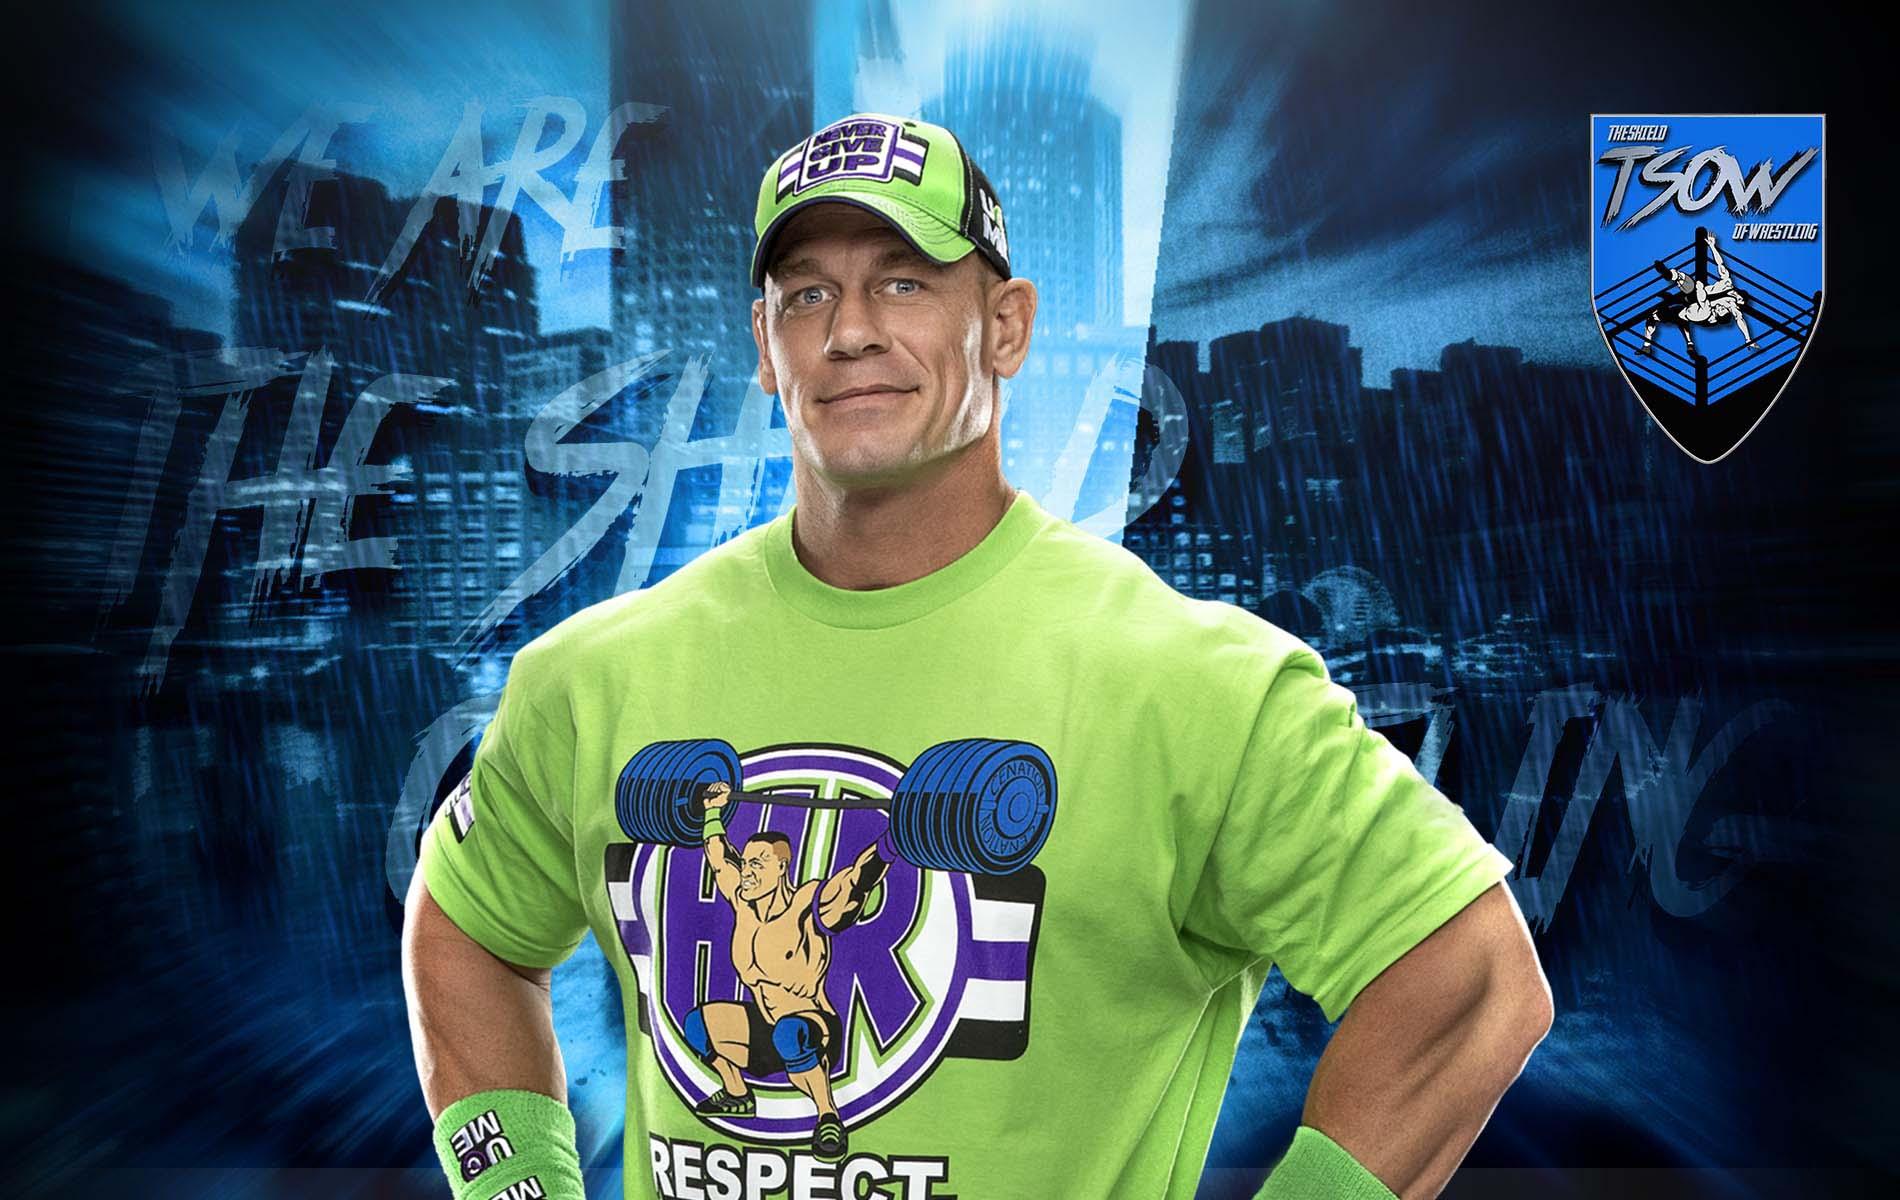 John Cena afferma che non sarà a WrestleMania 37